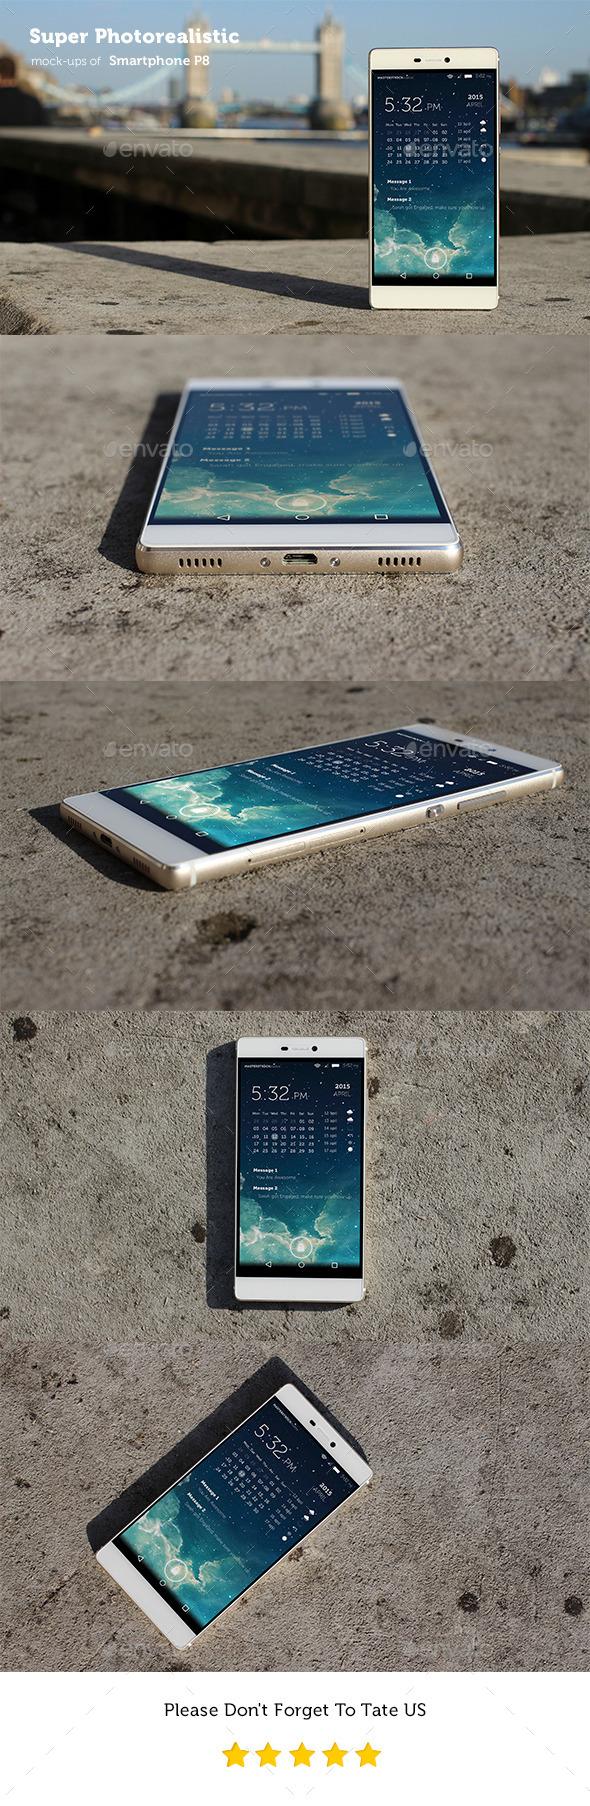 Photorealistic Smartphone P8 Mockups